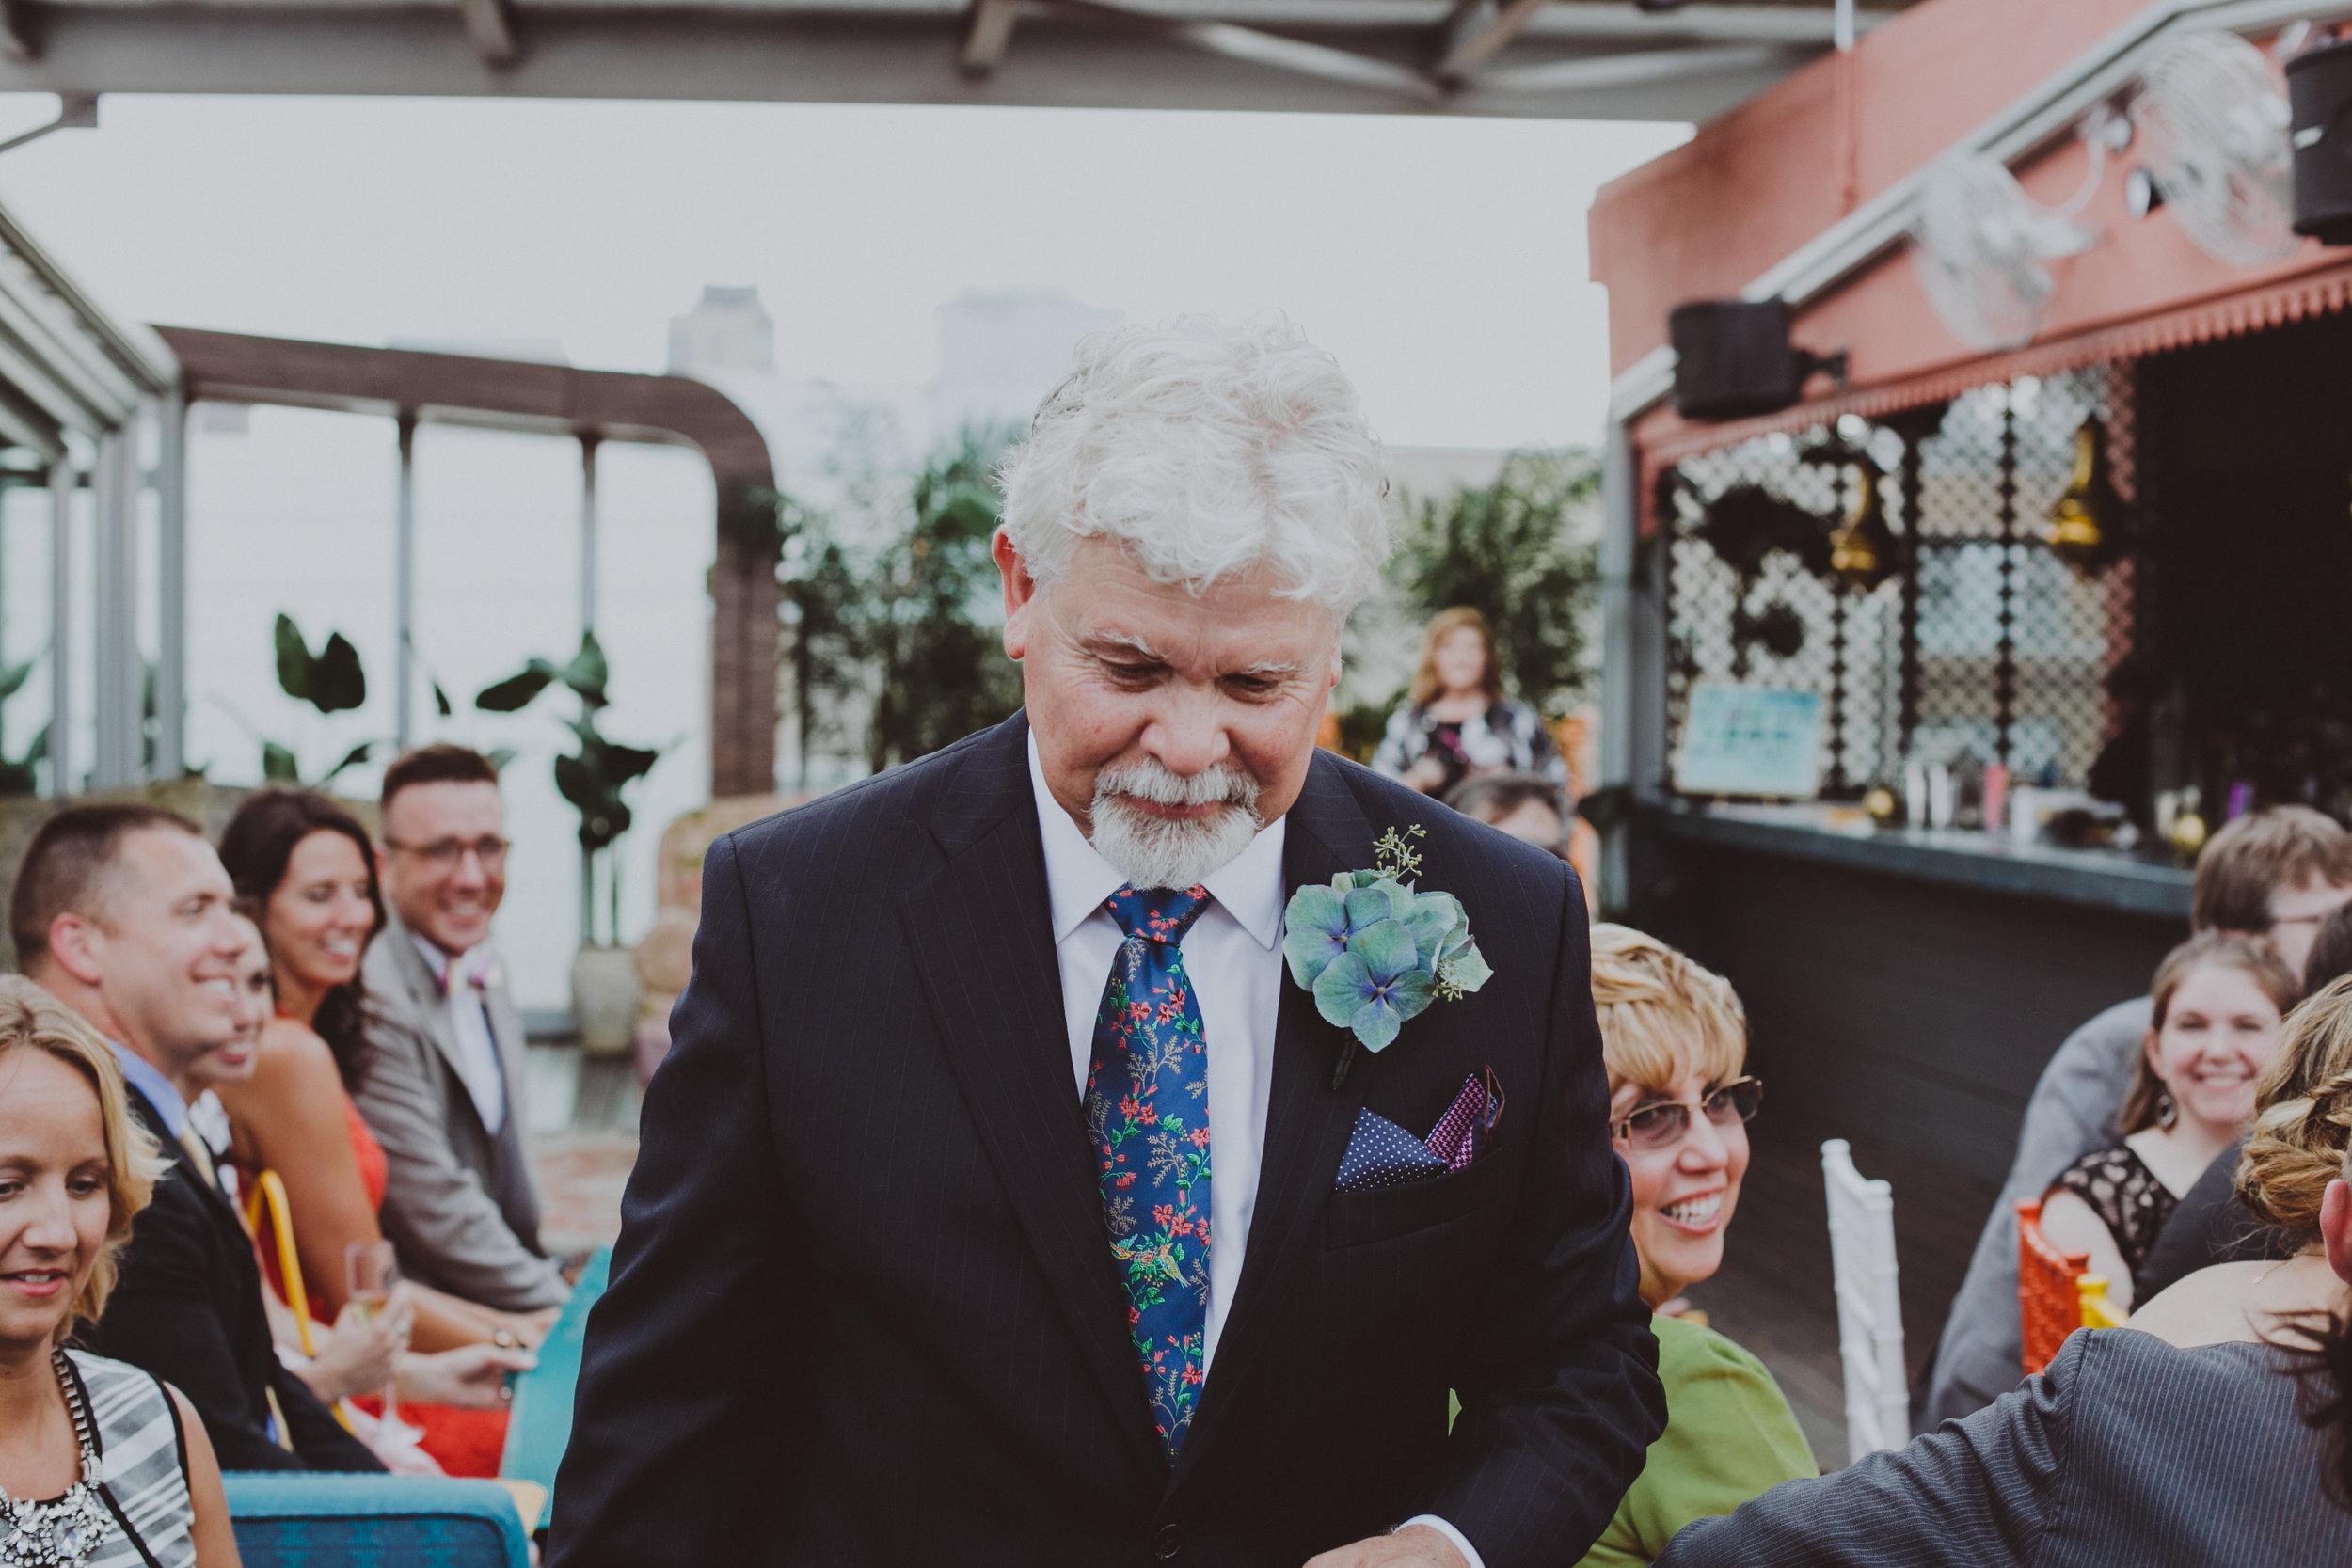 MCCARREN PARK WEDDING PHOTOGRAPHY CHELLISE MICHAEL WILLIAMSBURG BROOKLYN NYC